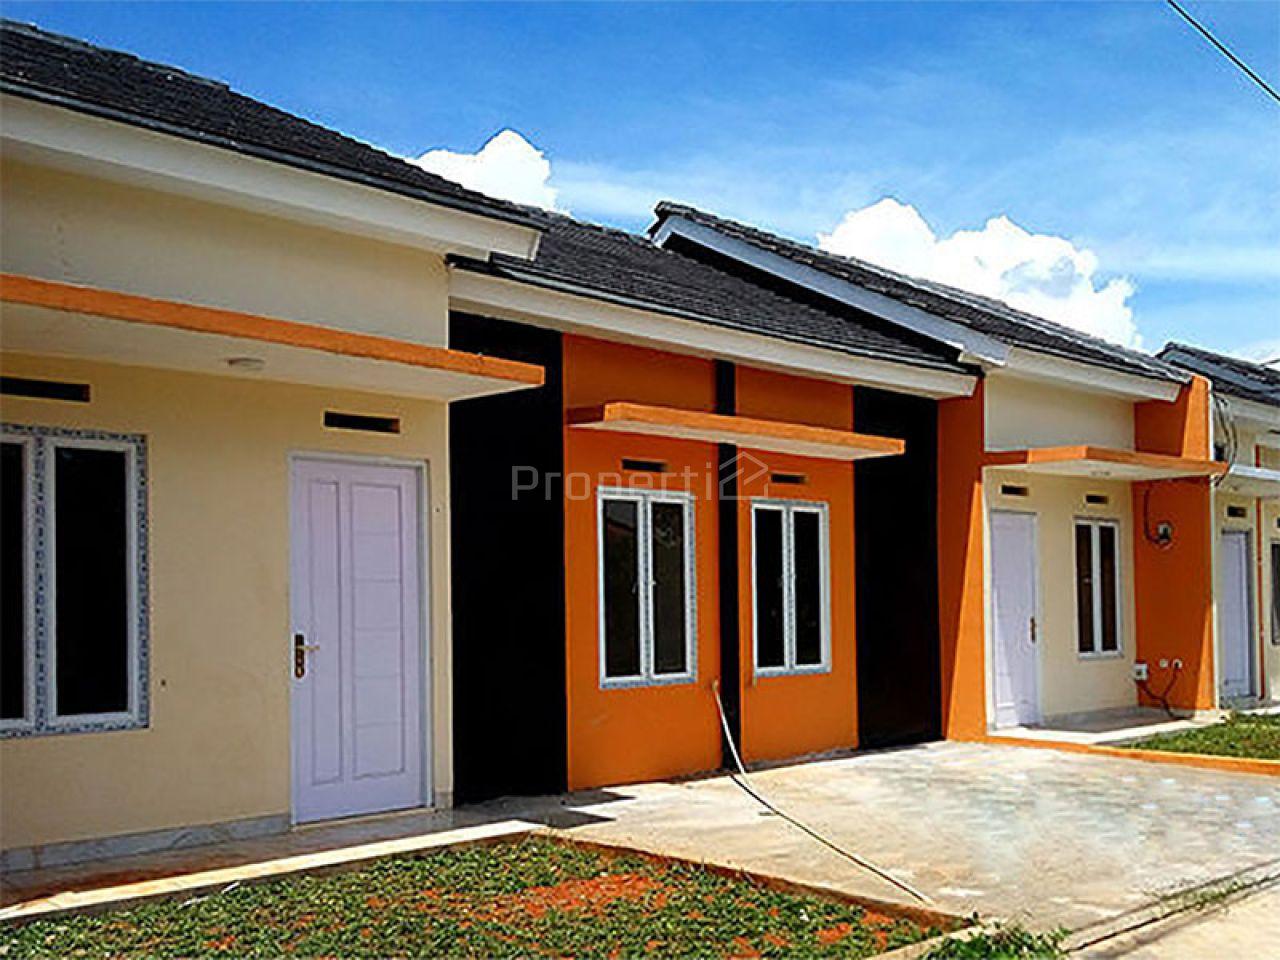 New House at Tigaraksa, Tangerang, Banten